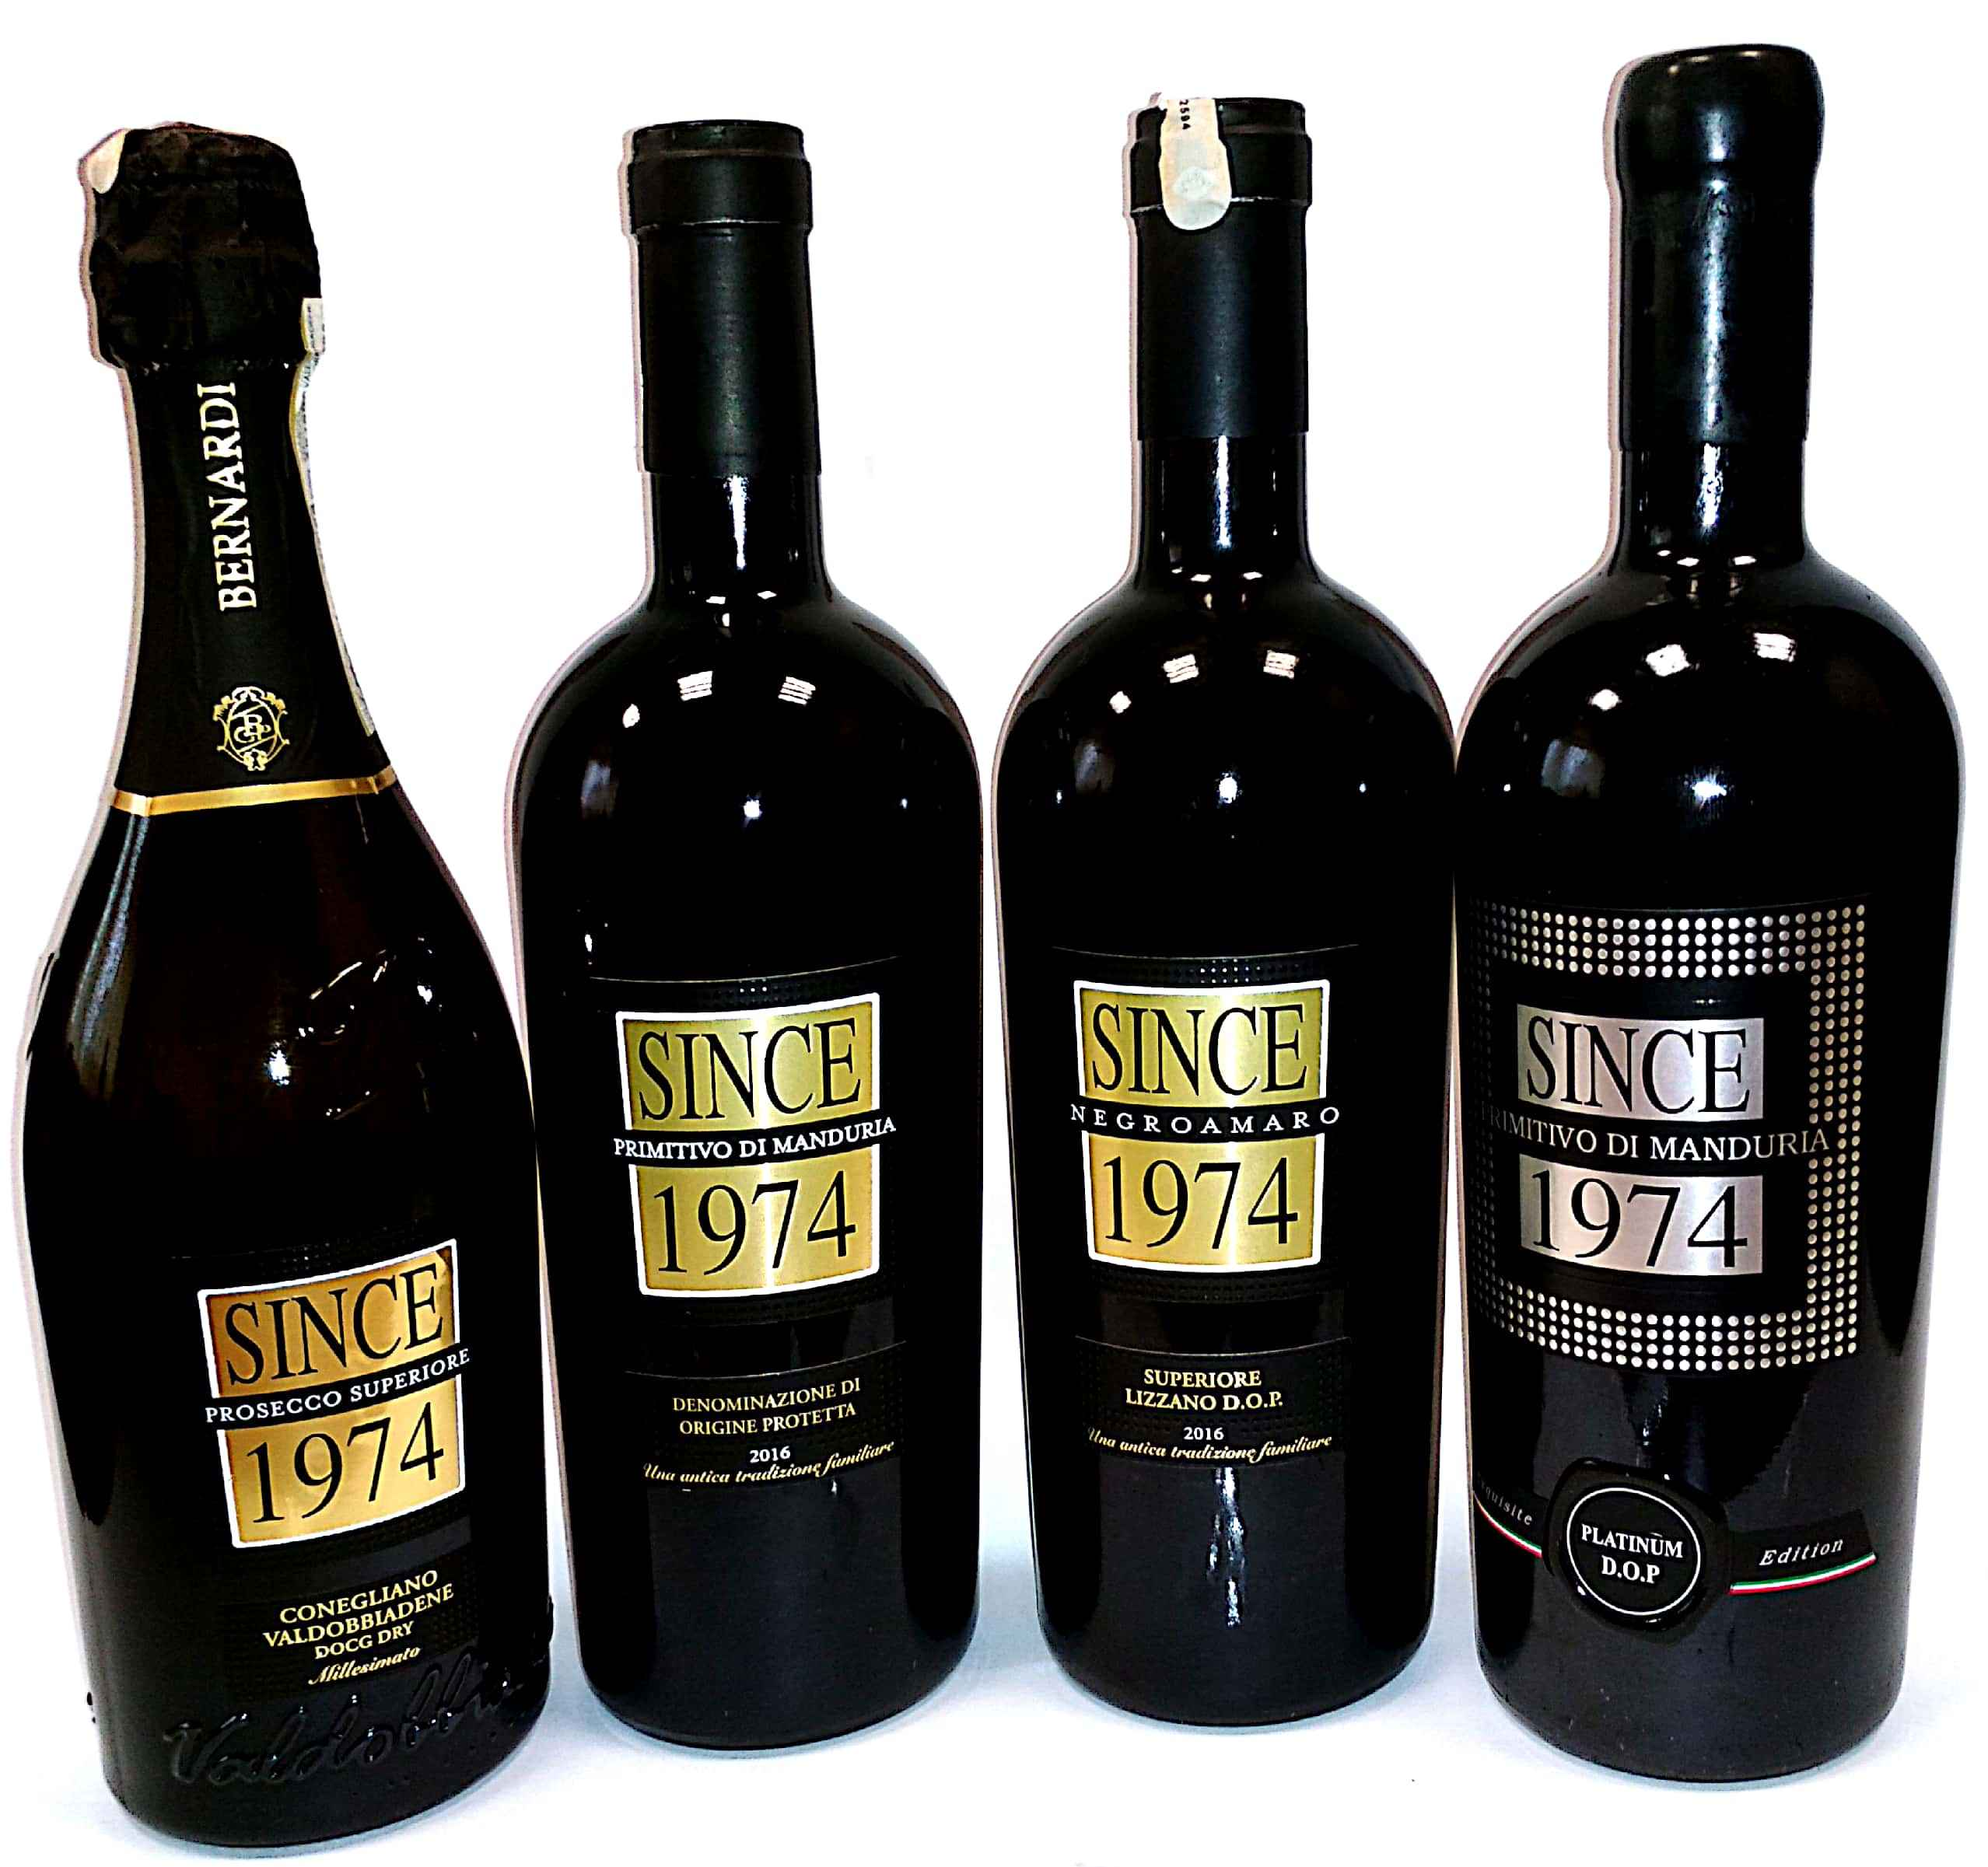 Since 1974 vynai